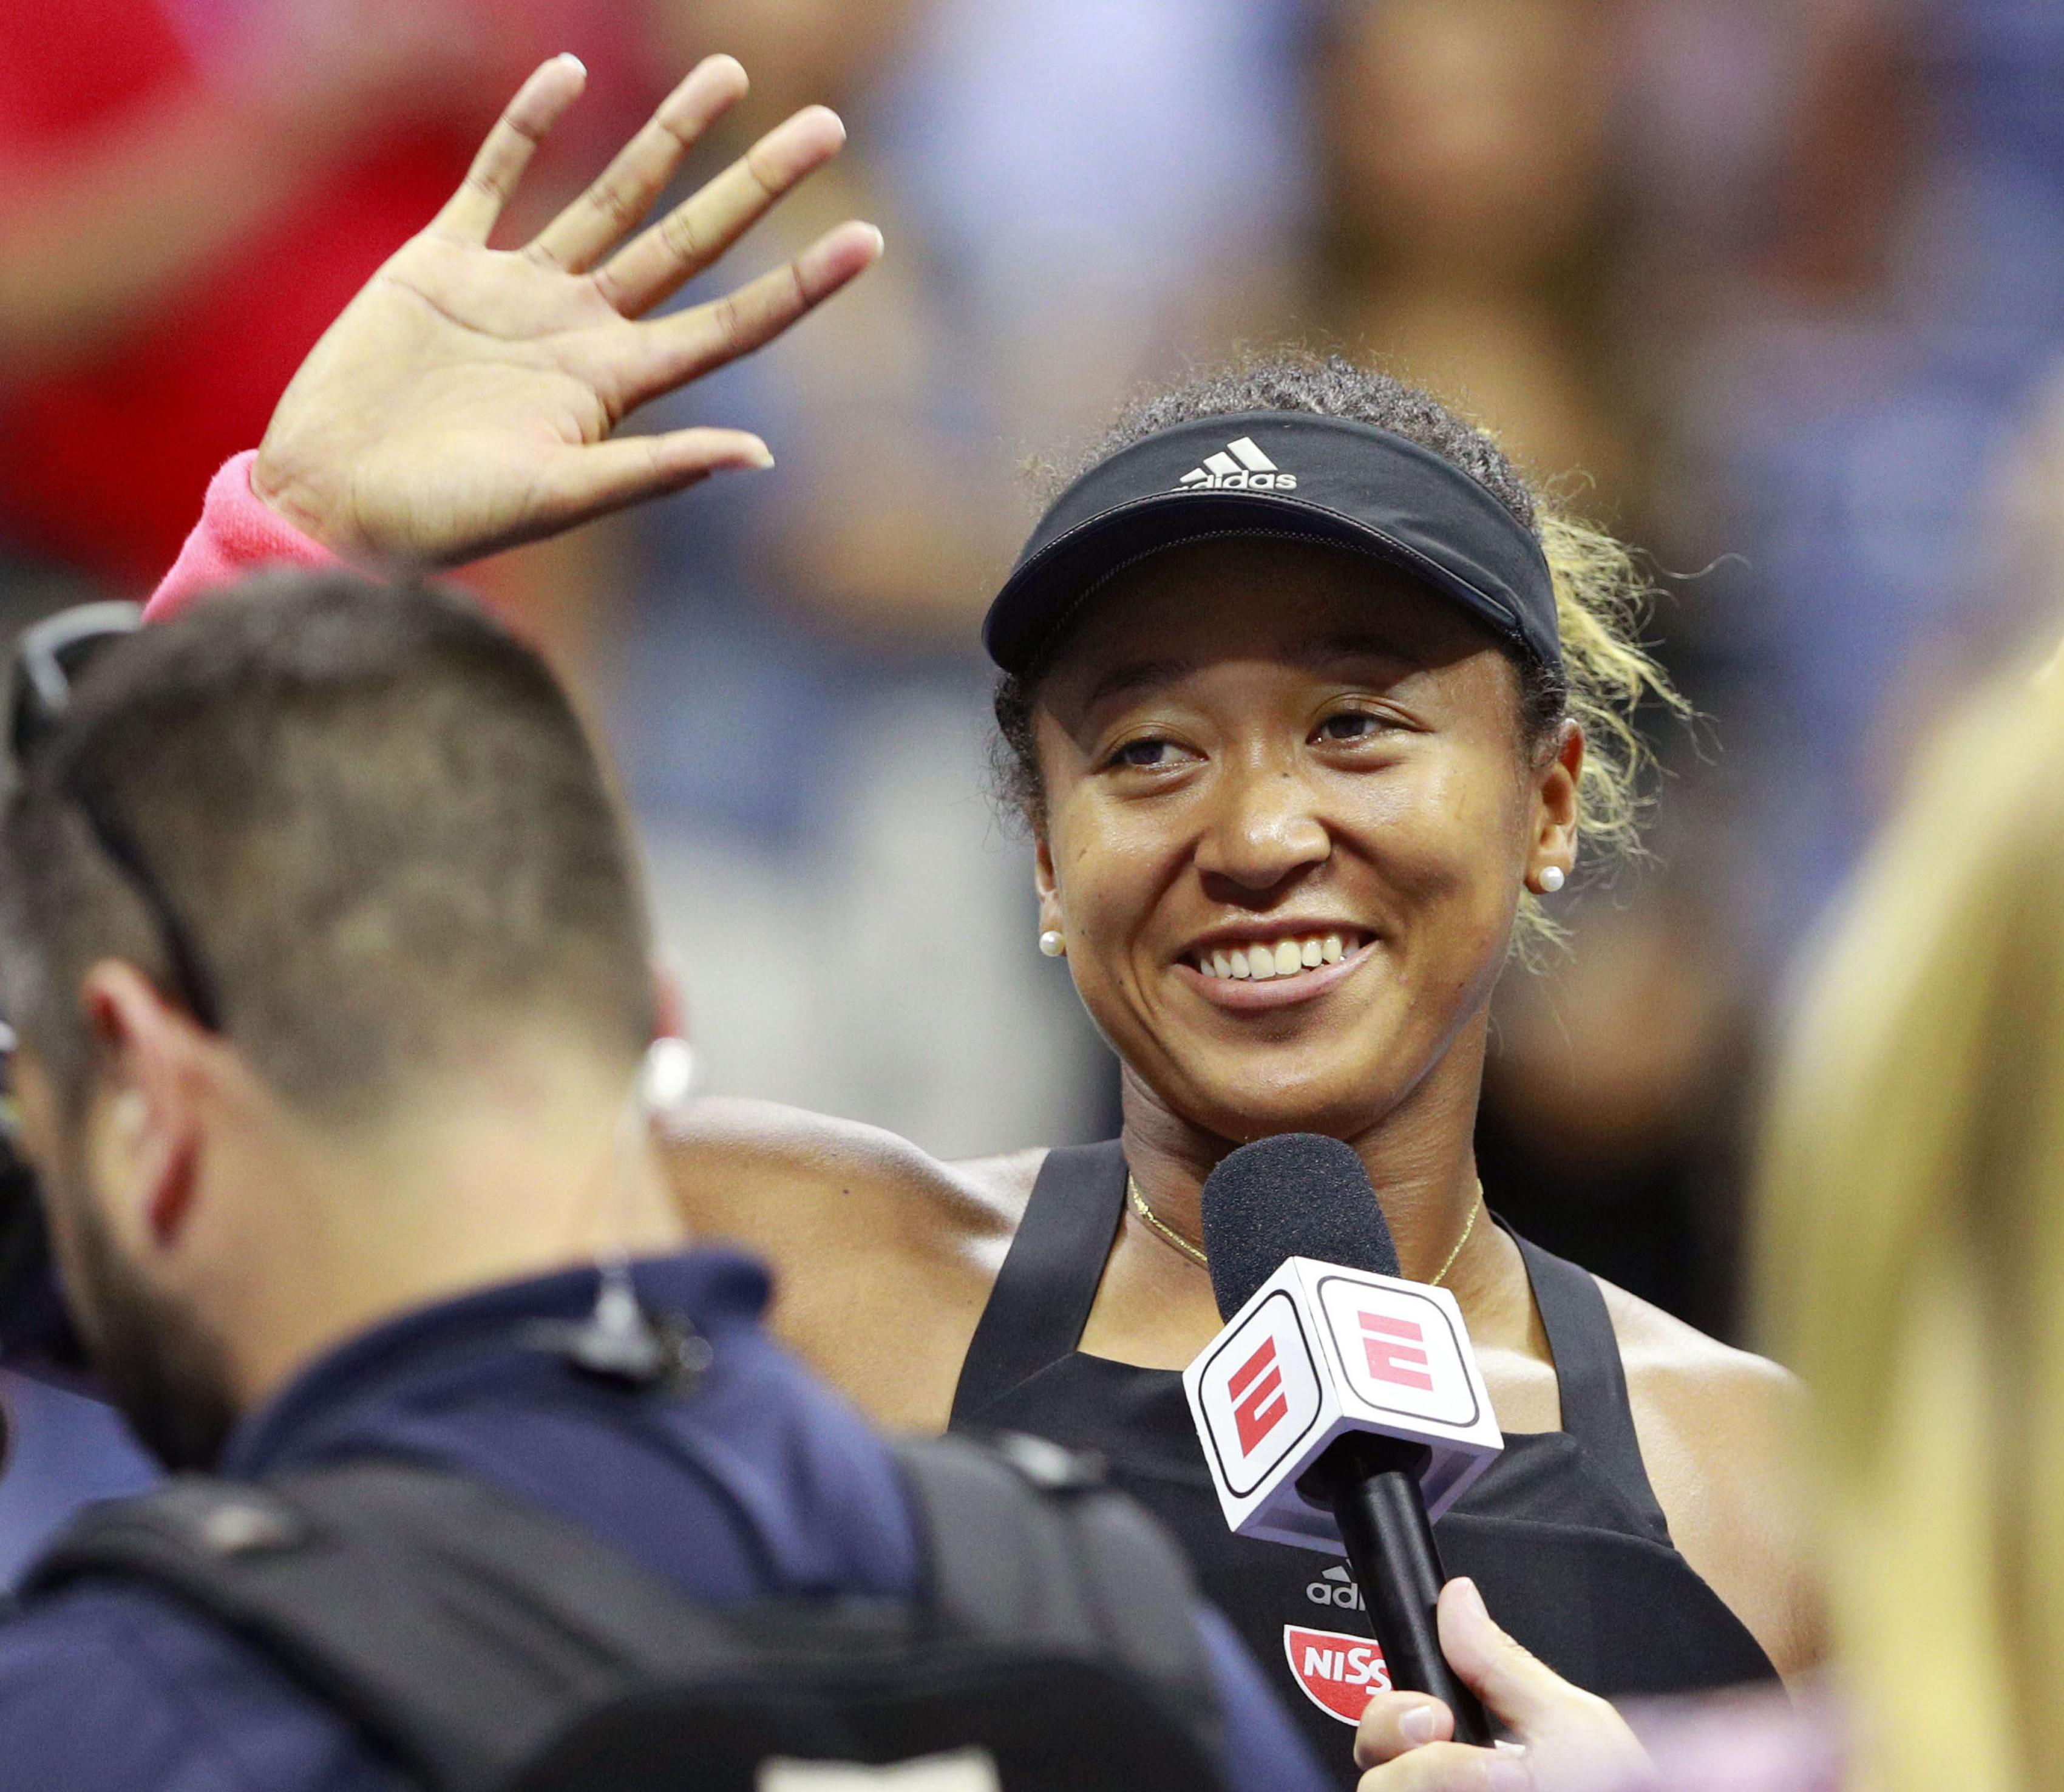 Naomi Osaka Becomes First Japanese Woman to Make U.S. Grand Slam